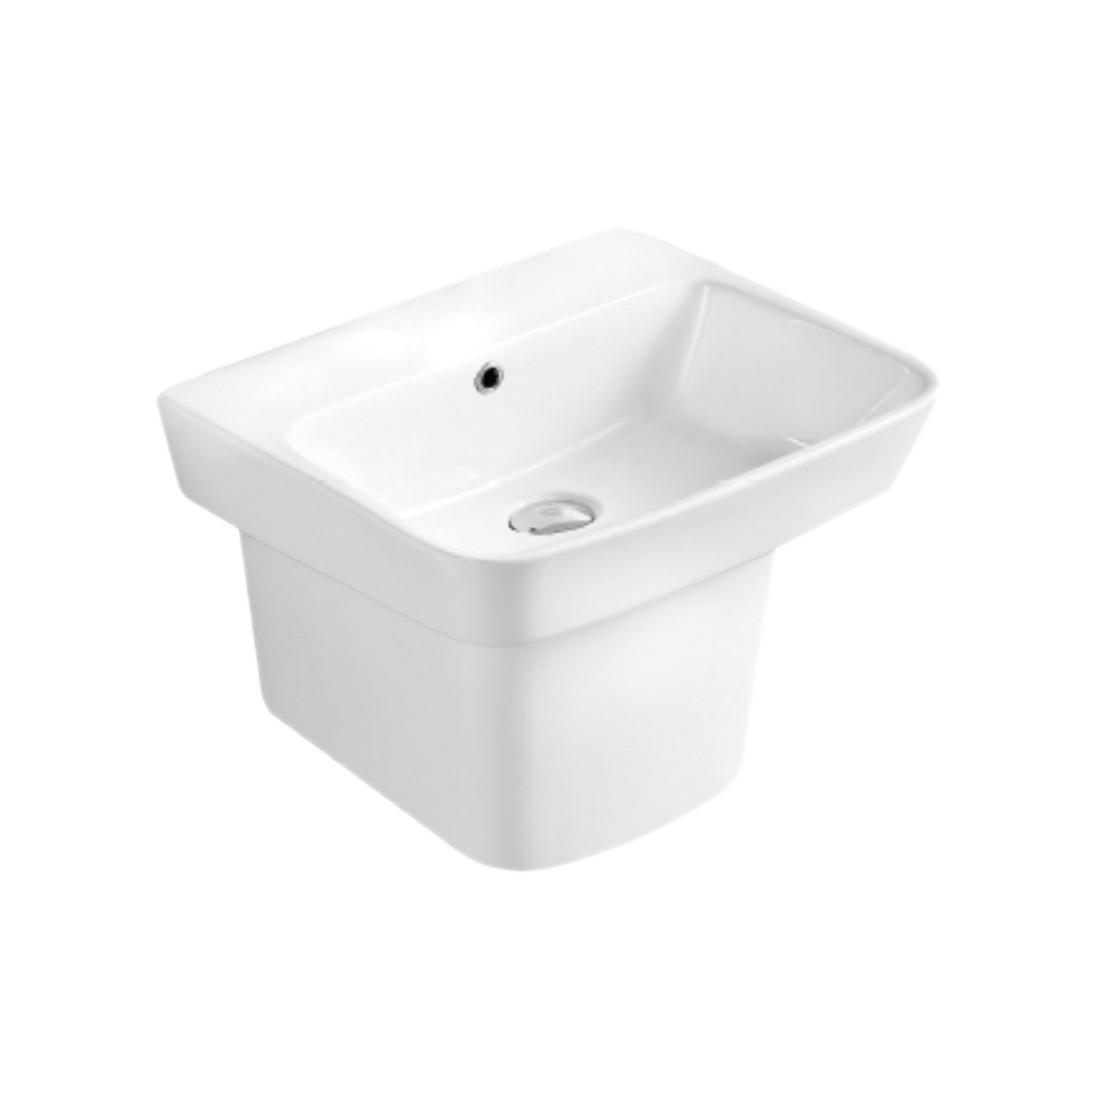 Kerovit Ewer KB6900 Wash Basin With Integrated Half Pedestal